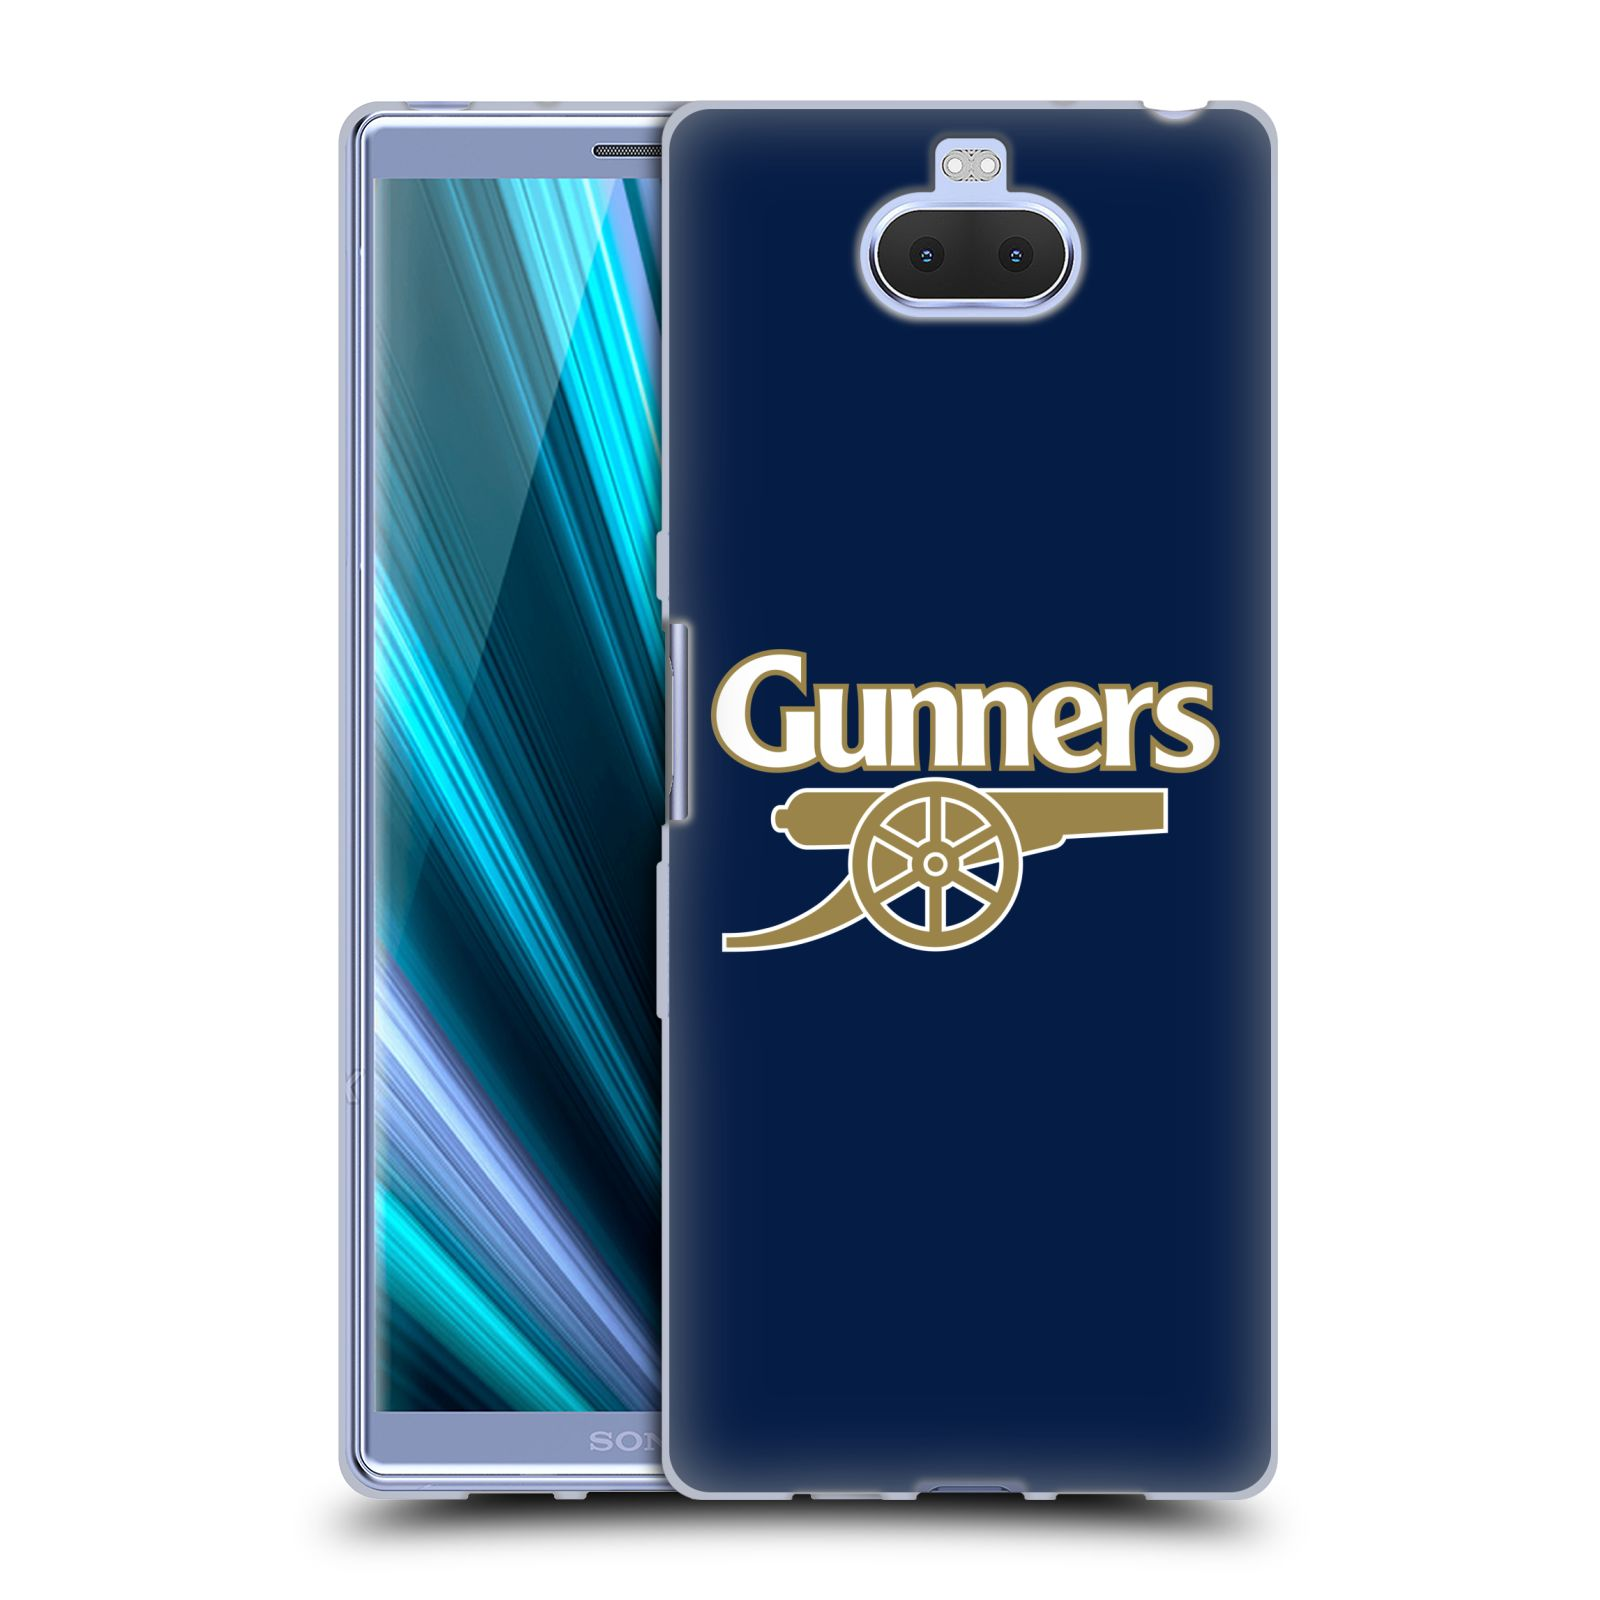 Silikonové pouzdro na mobil Sony Xperia 10 Plus - Head Case - Arsenal FC - Gunners